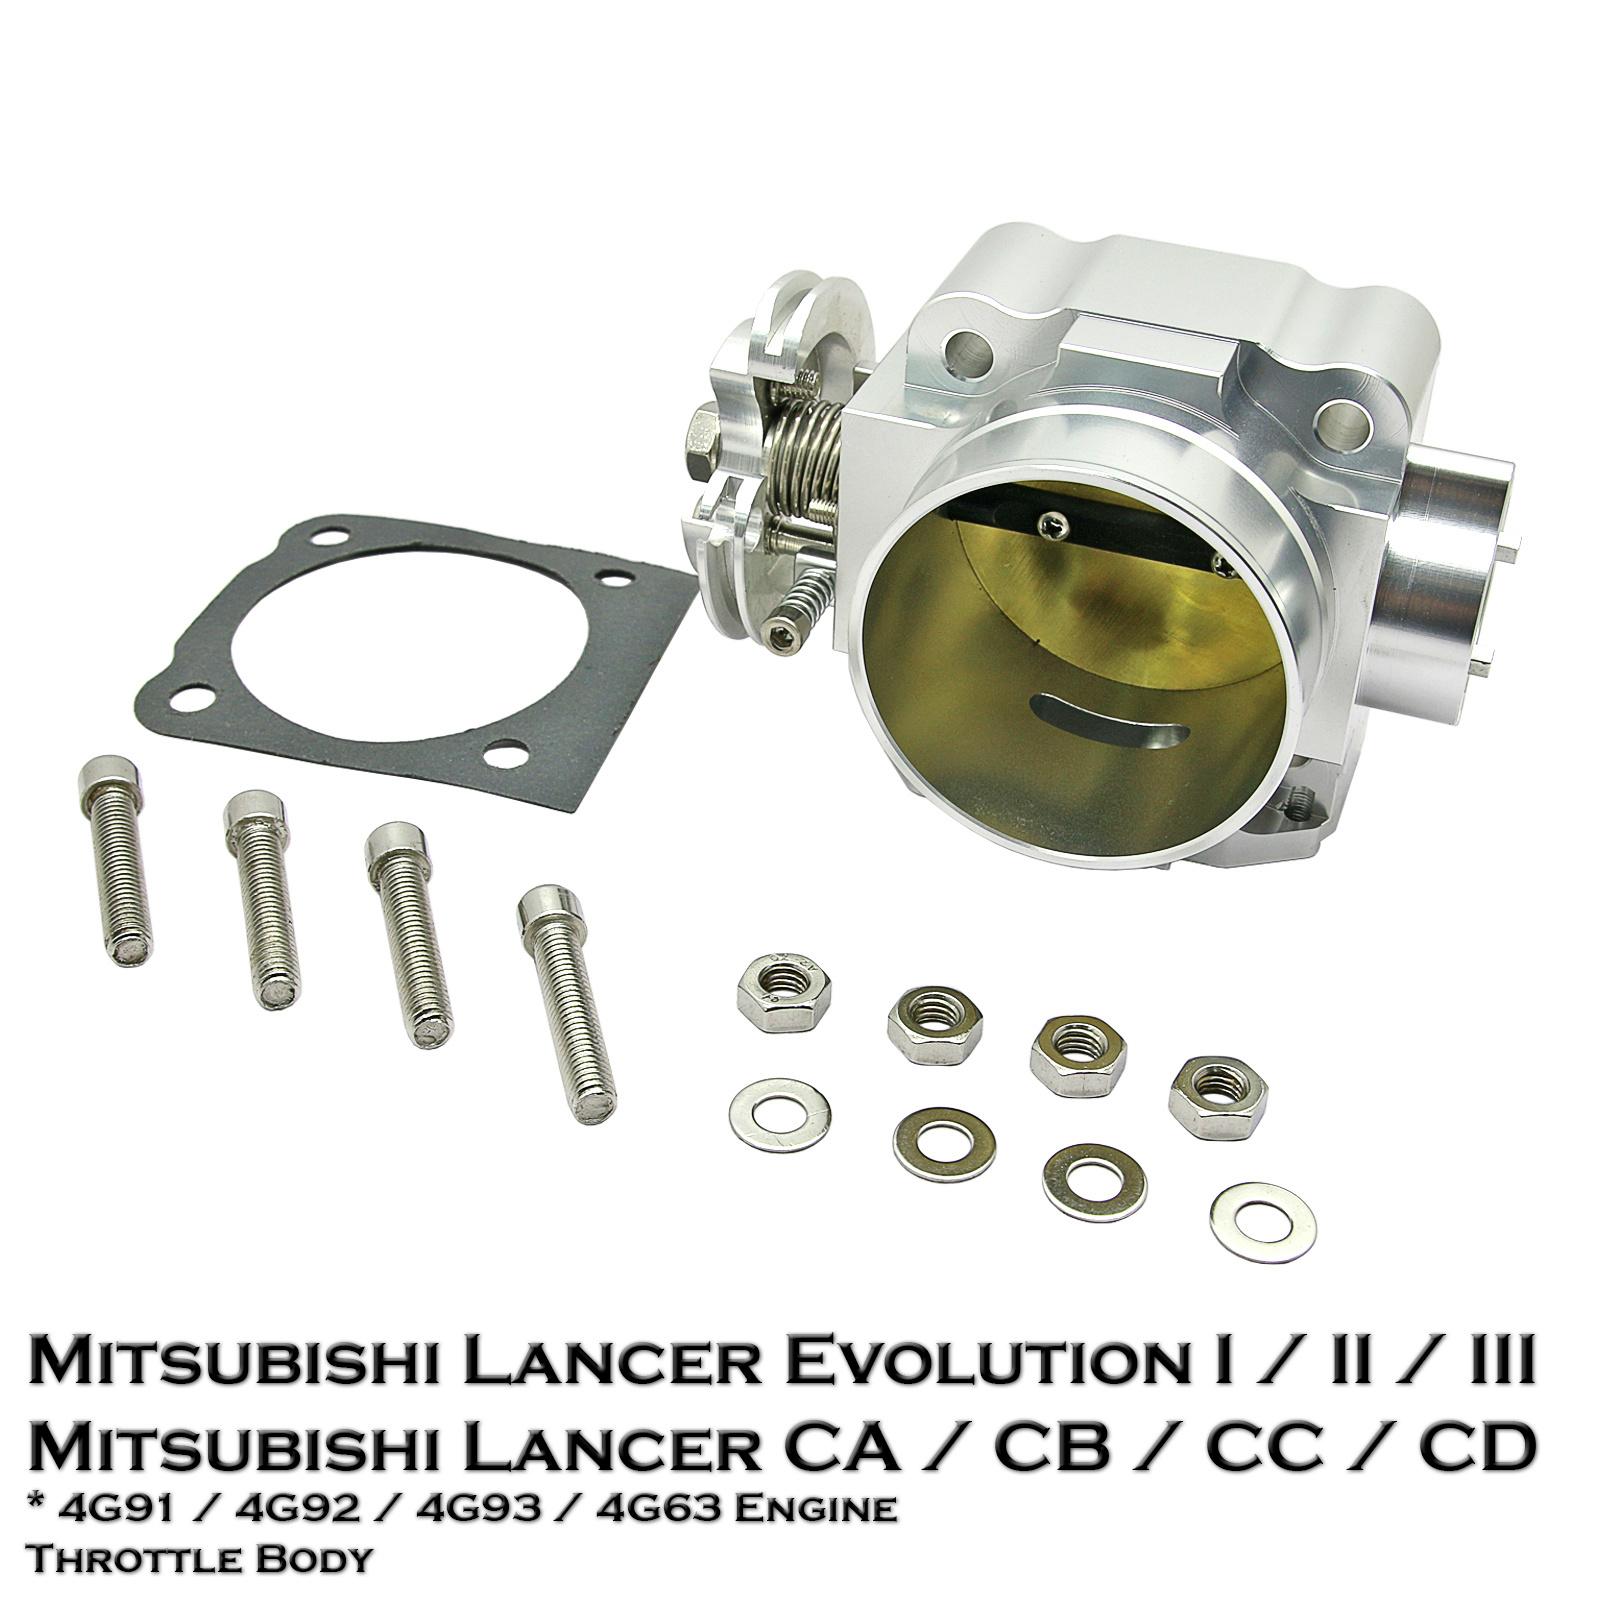 Aluminum 70mm Throttle Body For Mitsubishi Lancer: 70mm Aluminium Throttle Body Fit Mitsubishi Lancer Evo 1 2